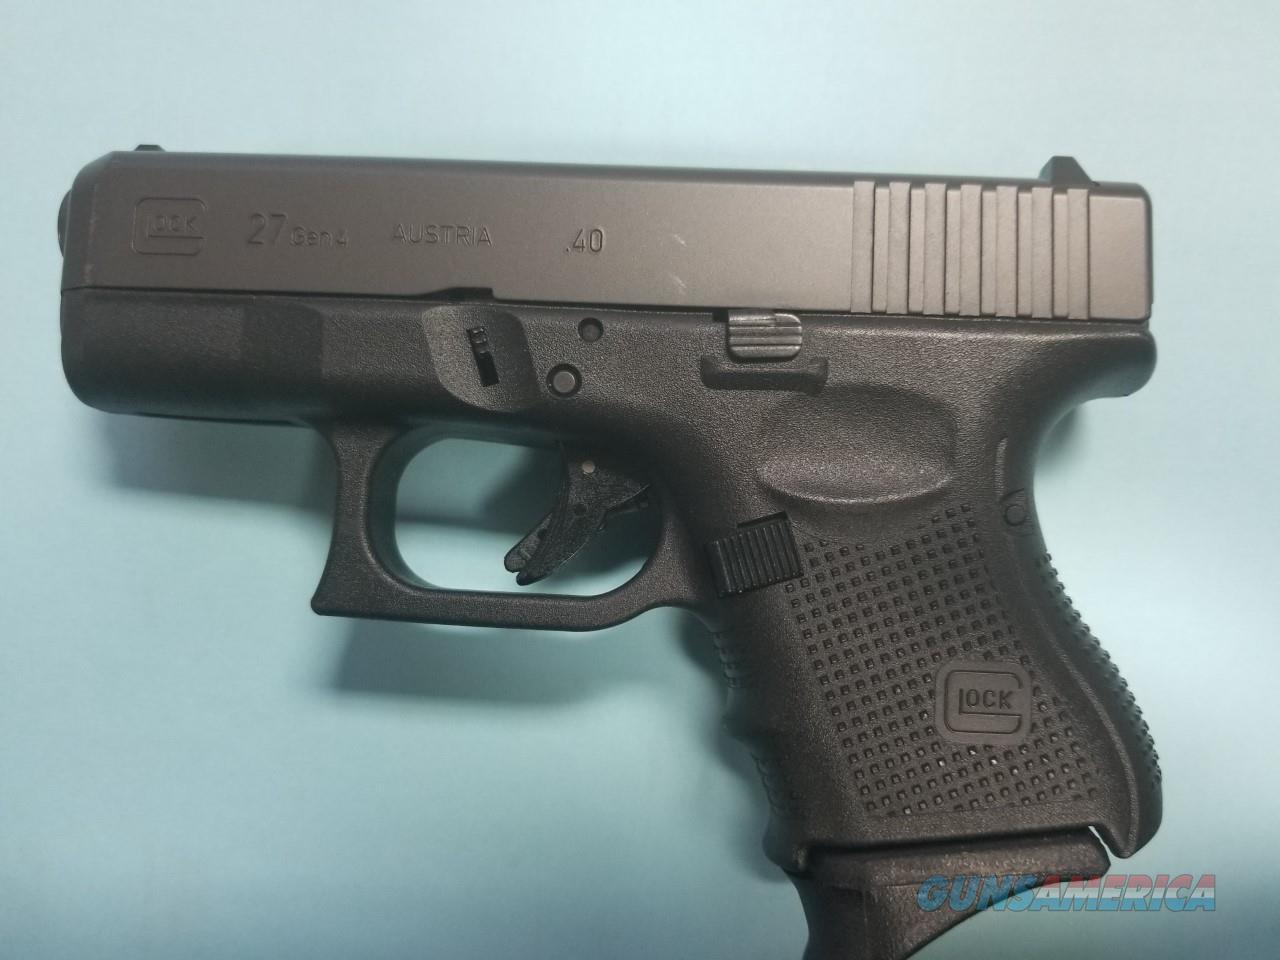 USED GLOCK 27 GEN-4, 40S&W, WITH BOX  Guns > Pistols > Glock Pistols > 26/27